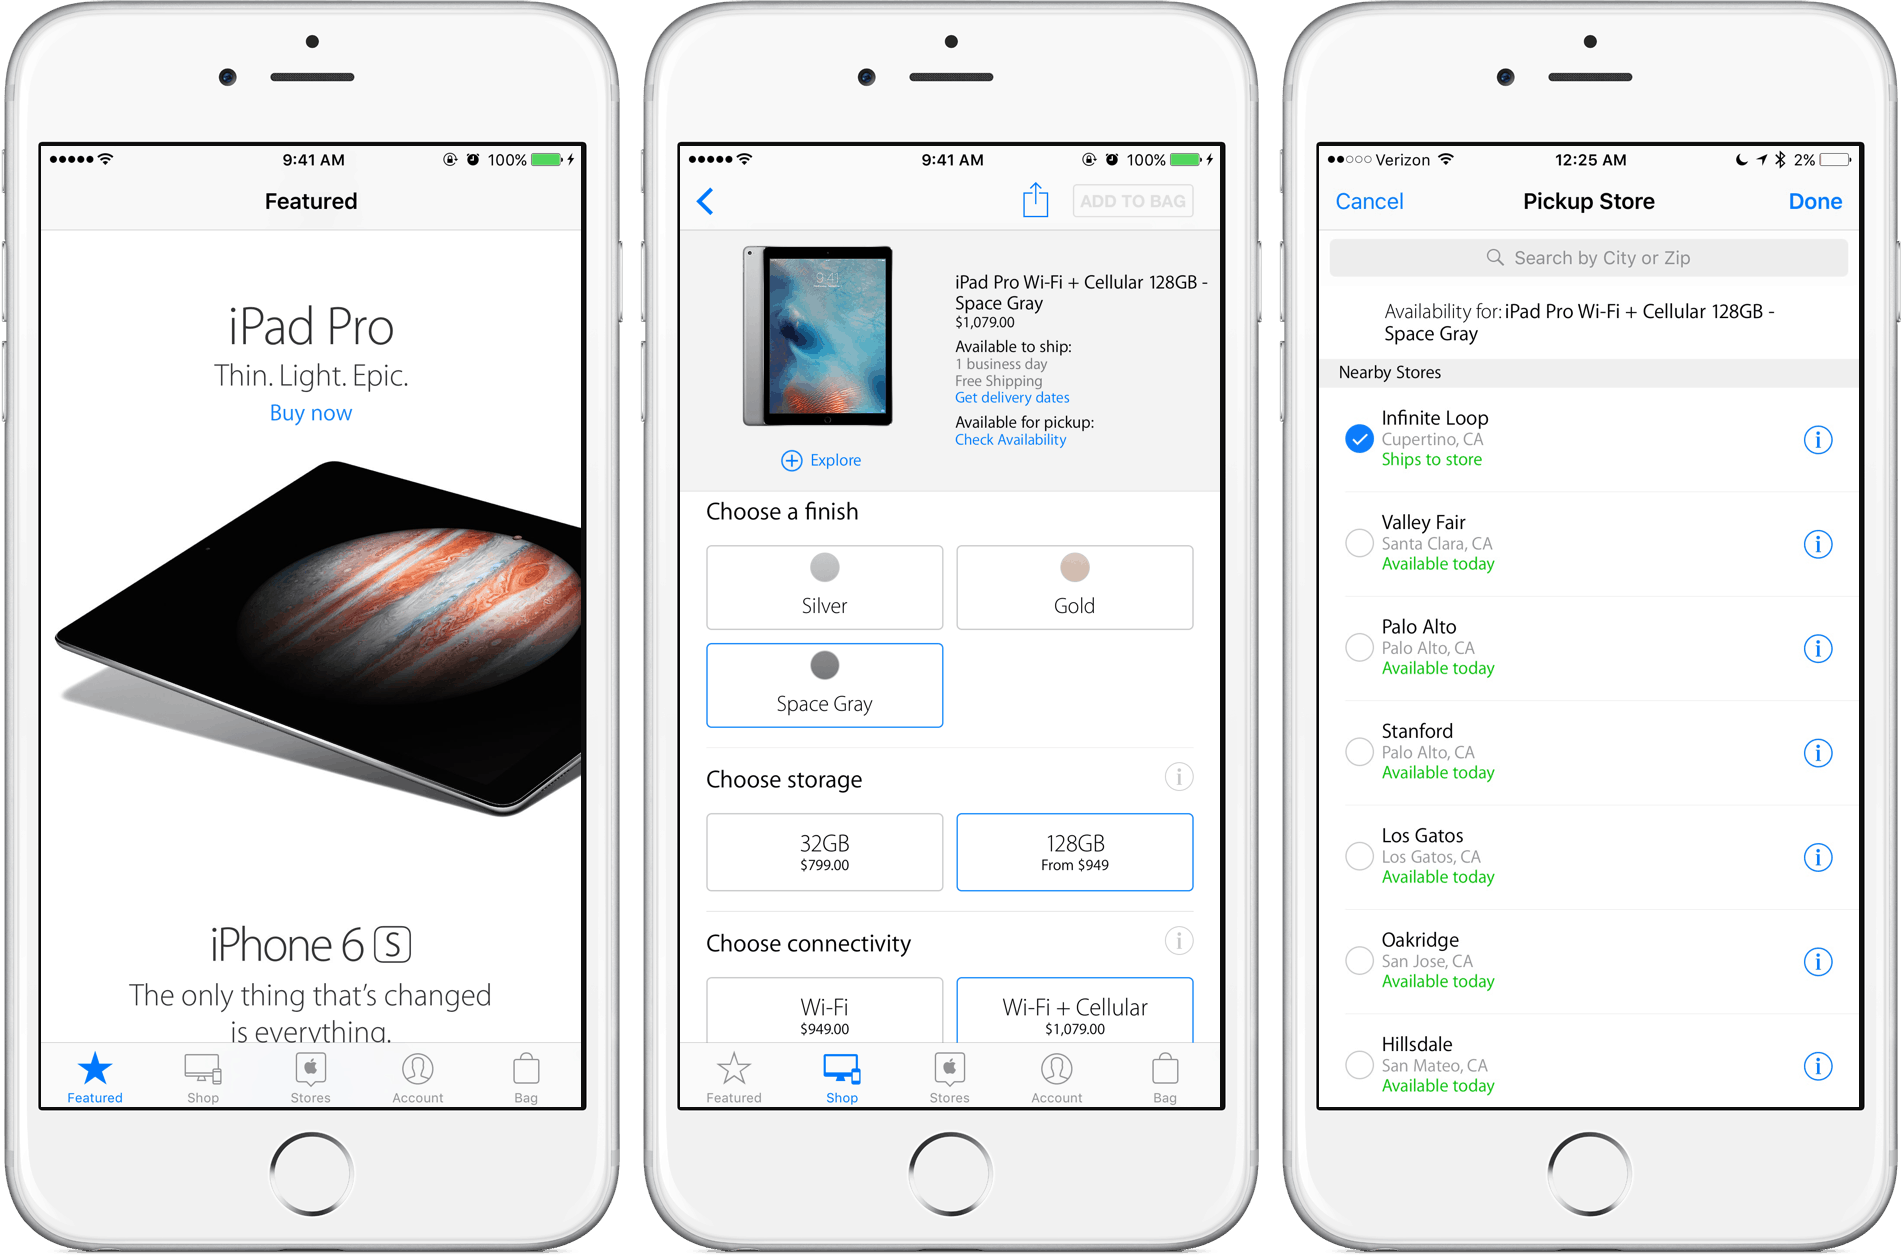 iPad-Pro-in-store-pickup